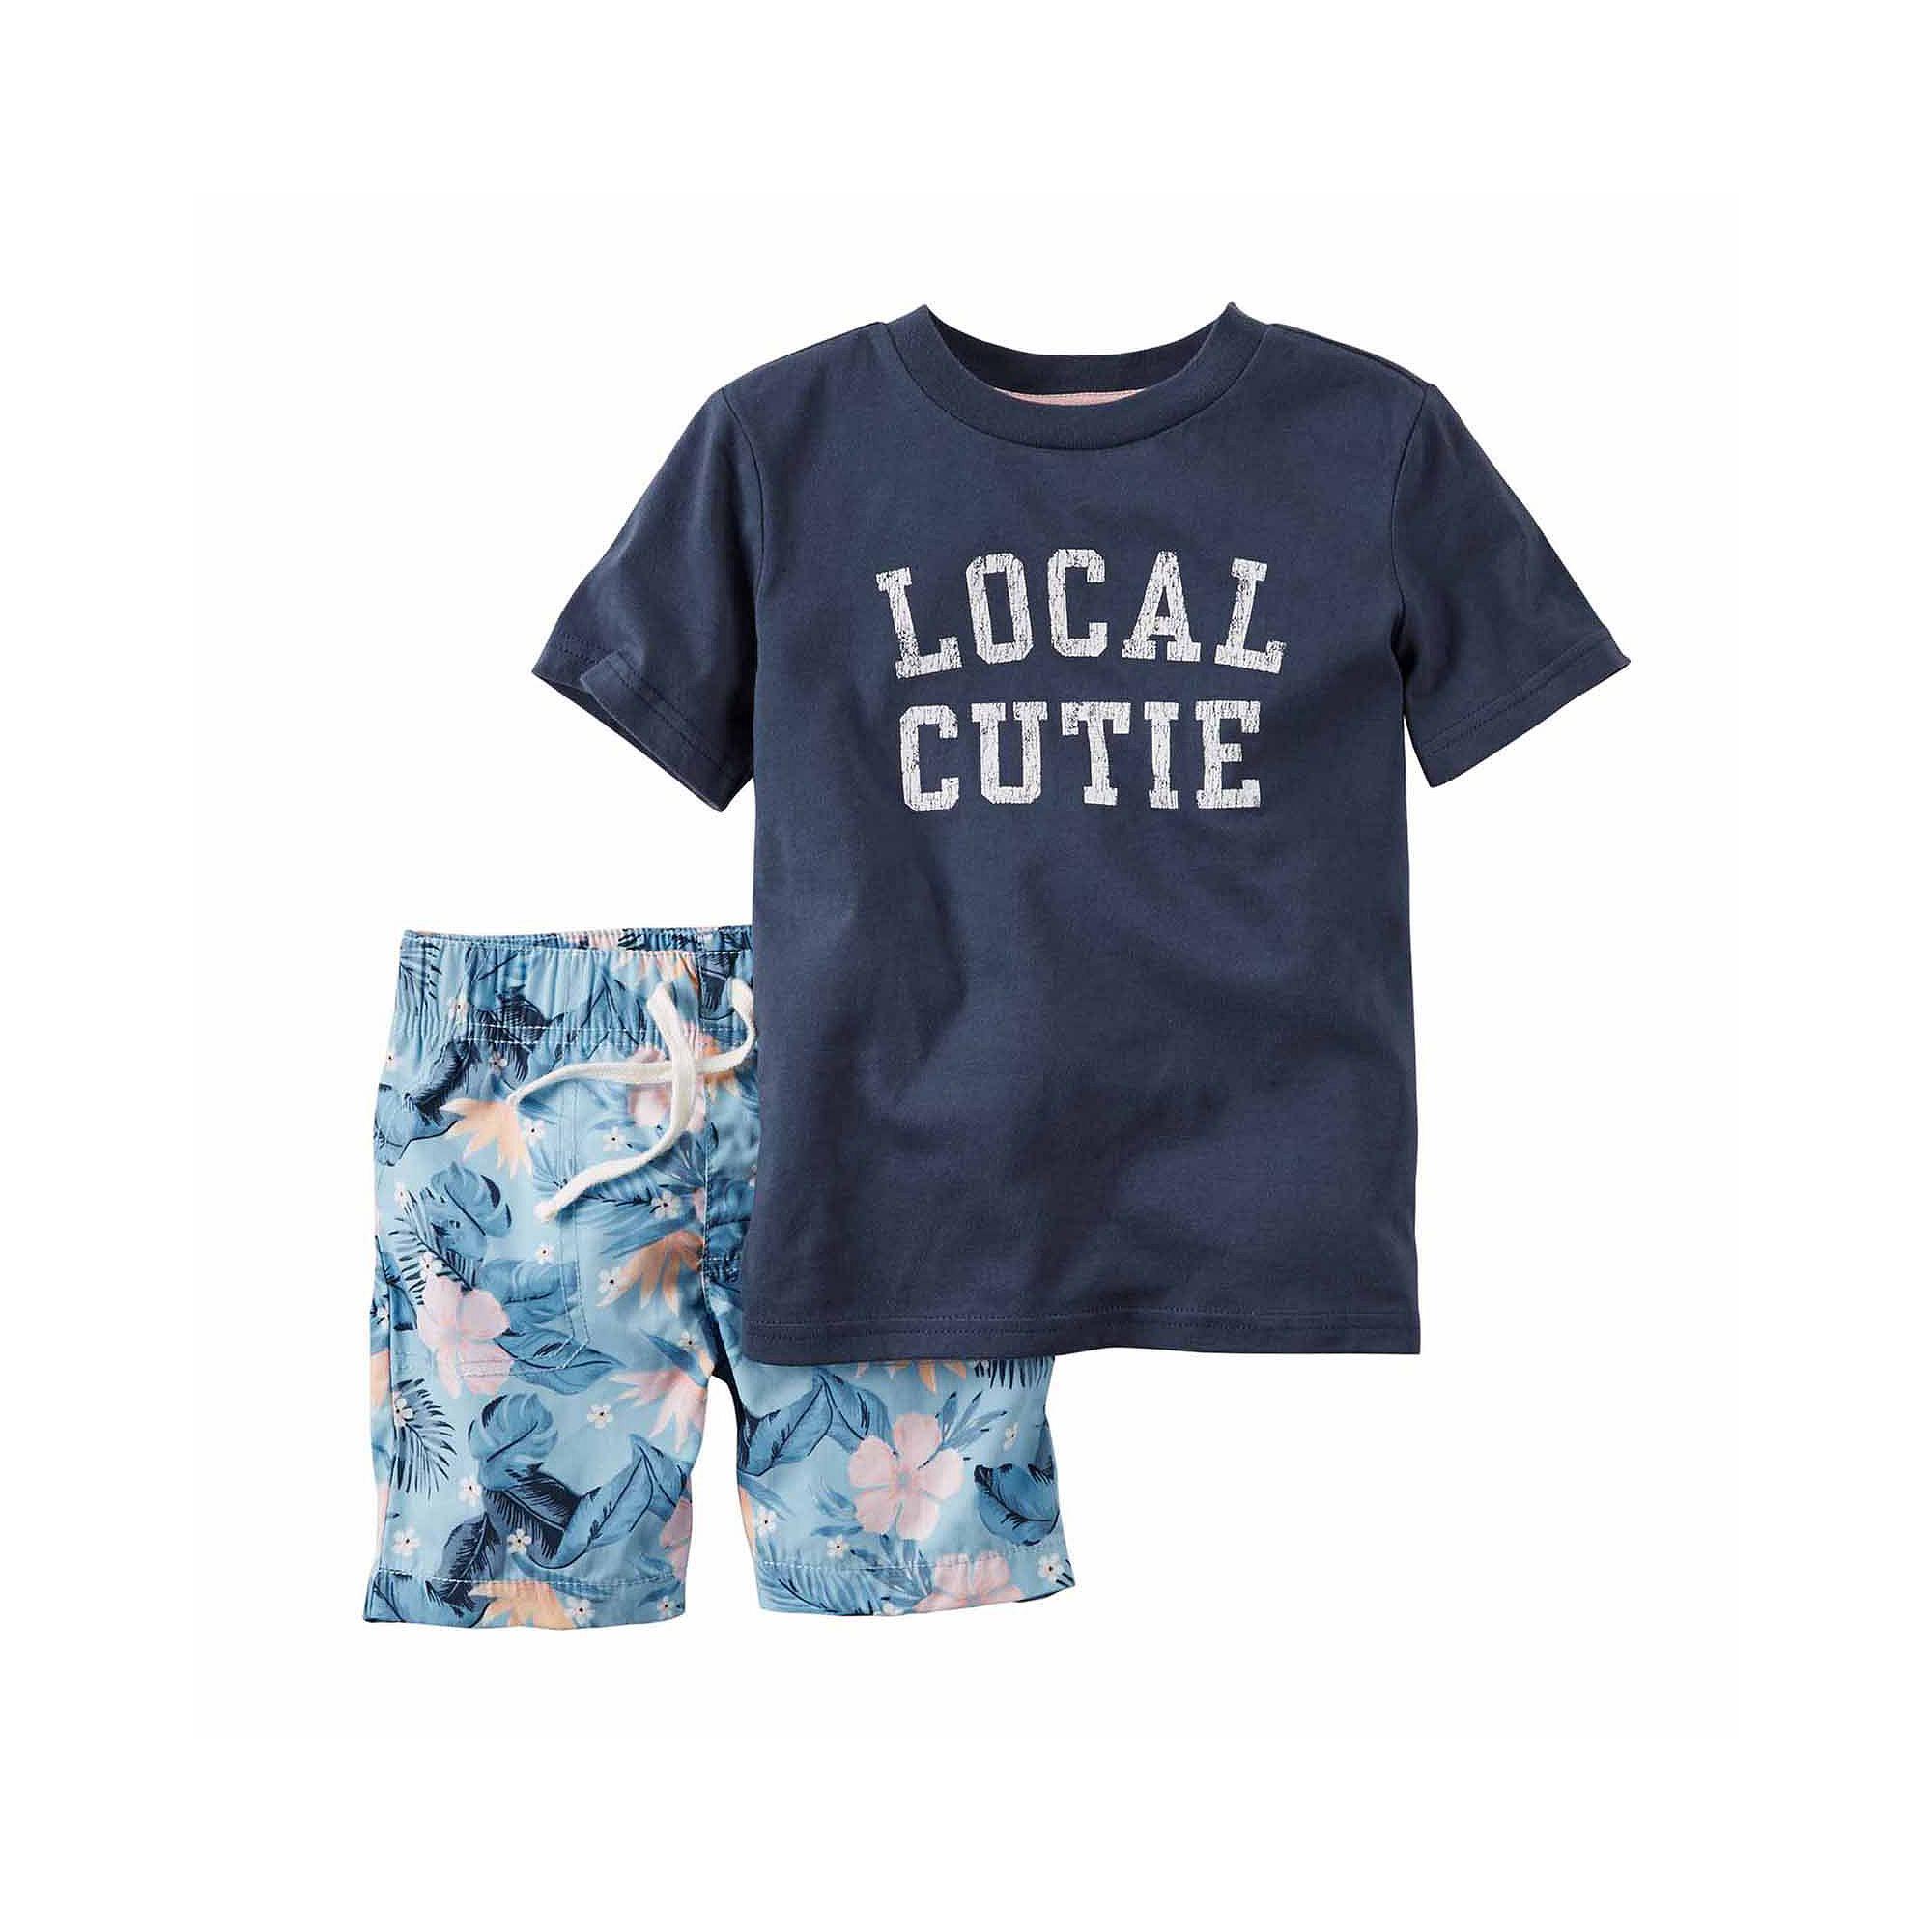 Carters Baby Boys 2 Pc Playwear Sets 229g136